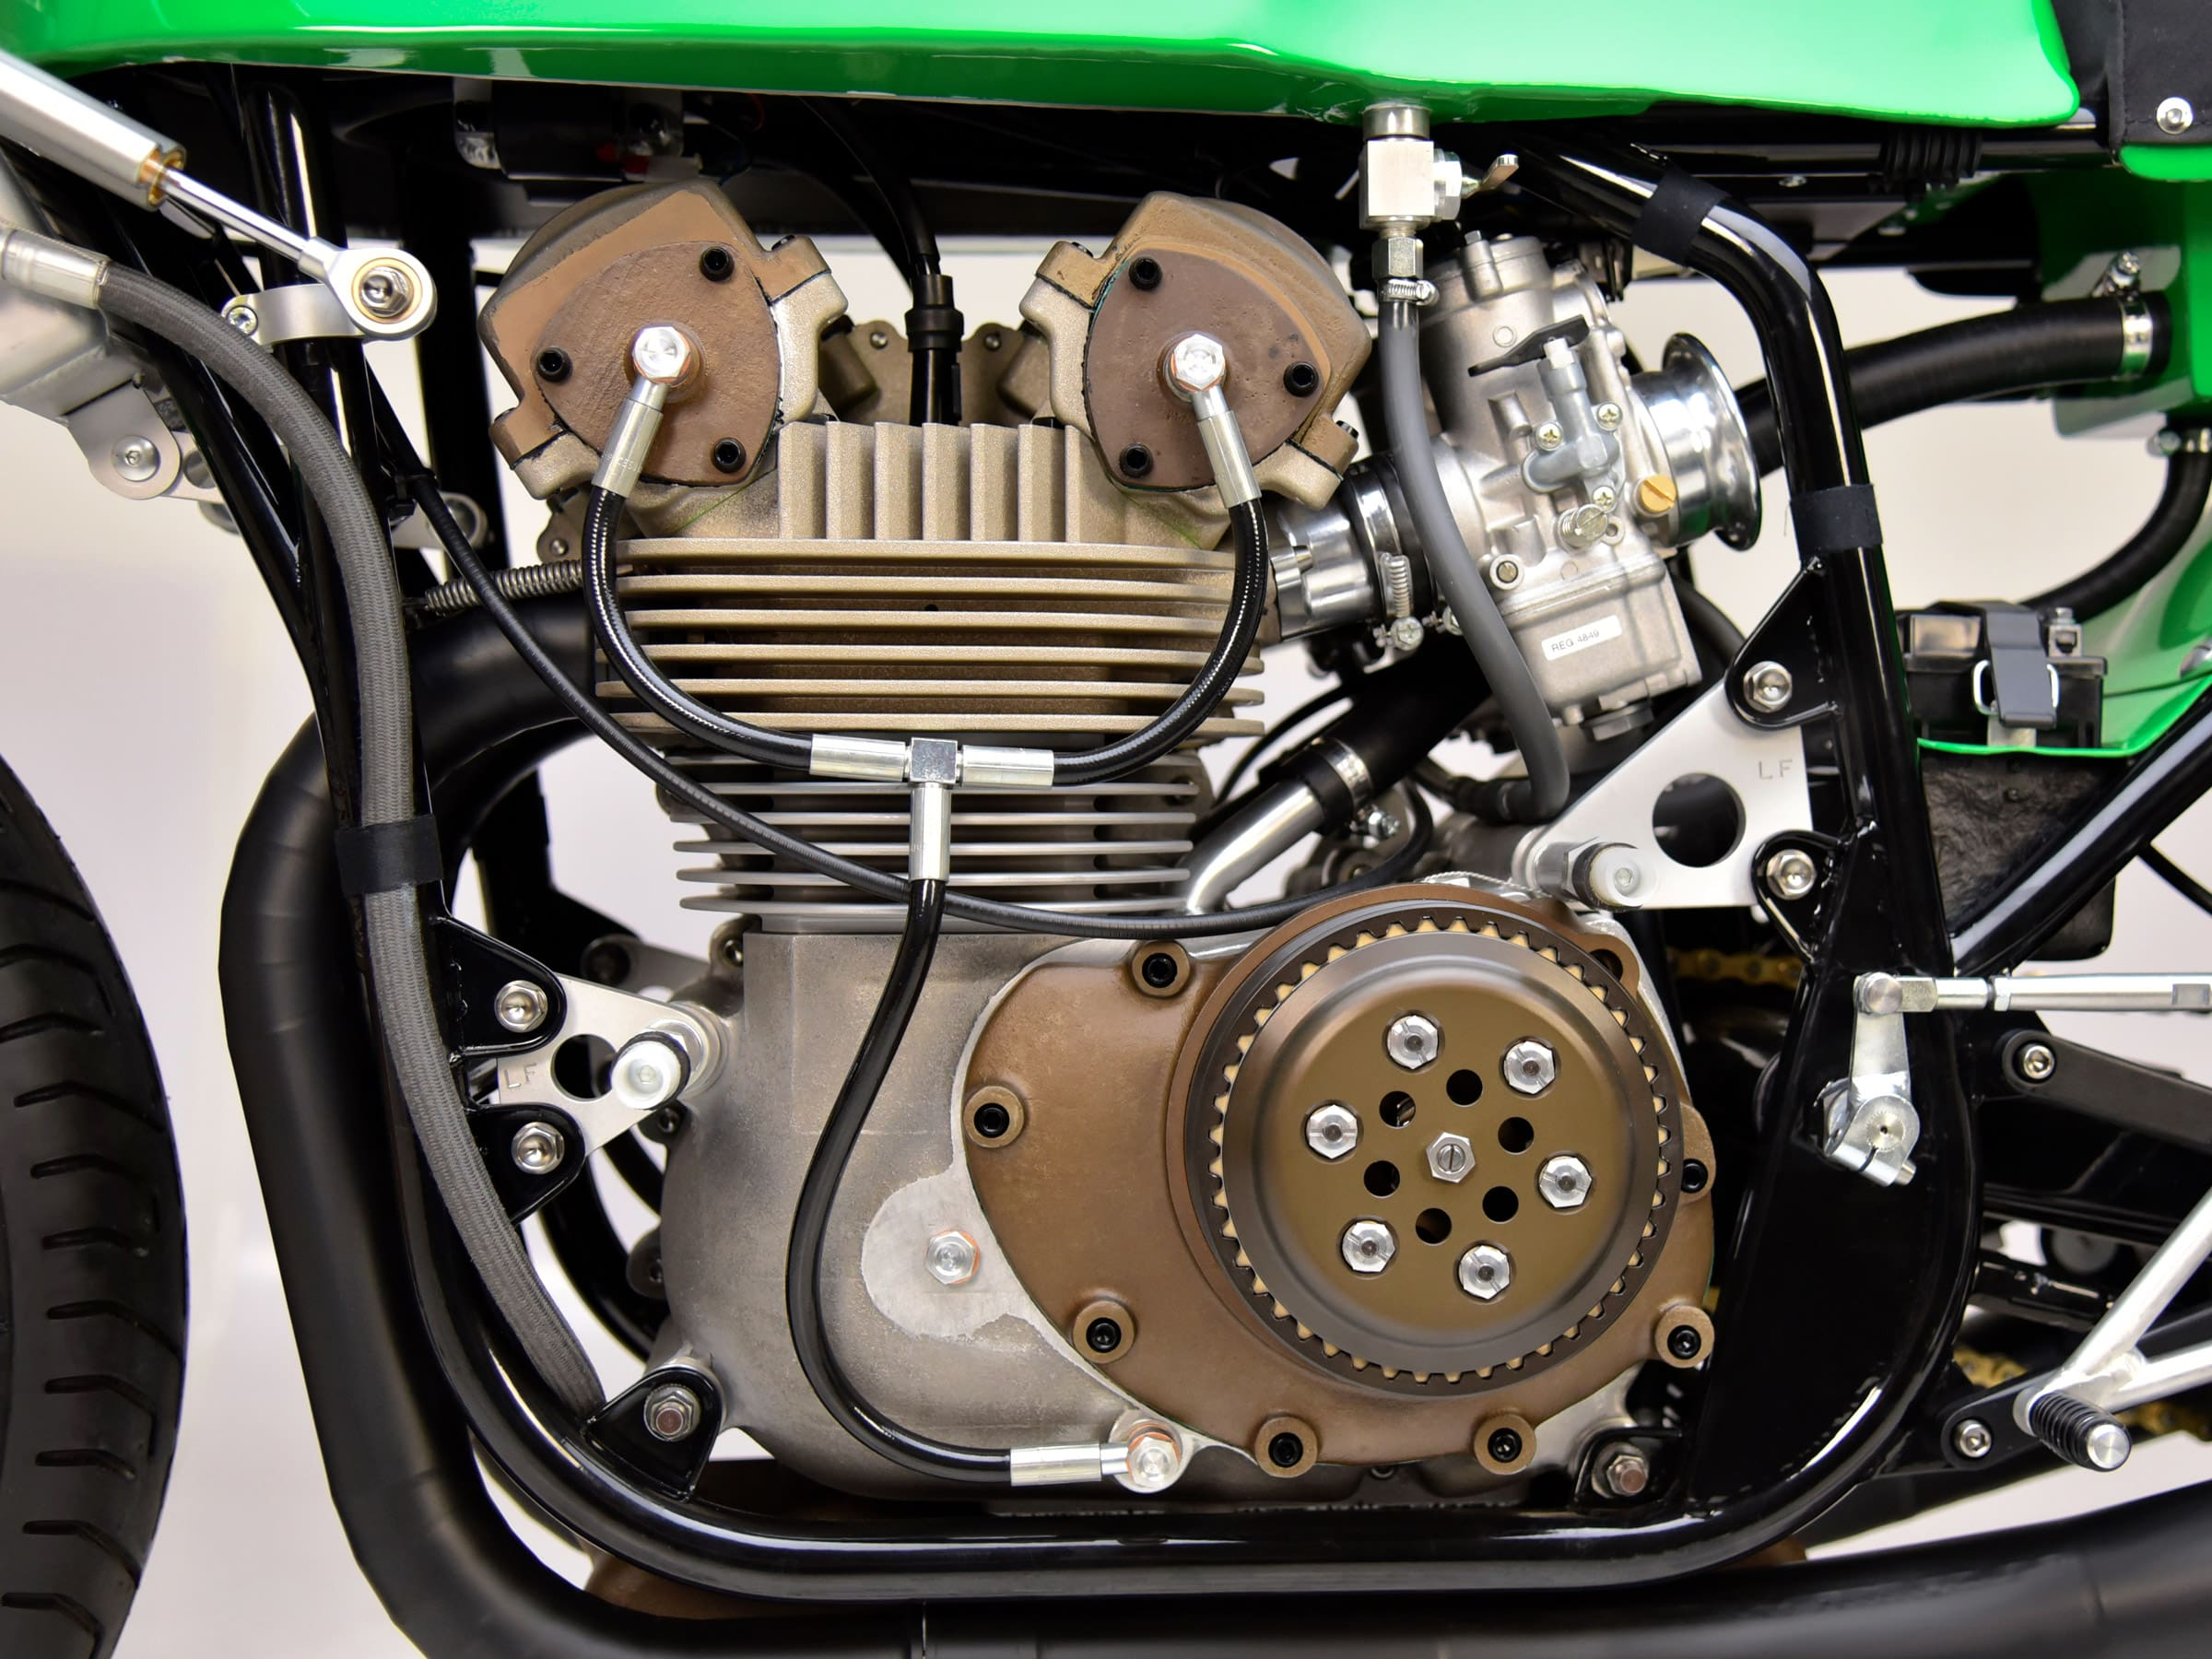 Paton_BIC-500_Parts-MotoreSX-min